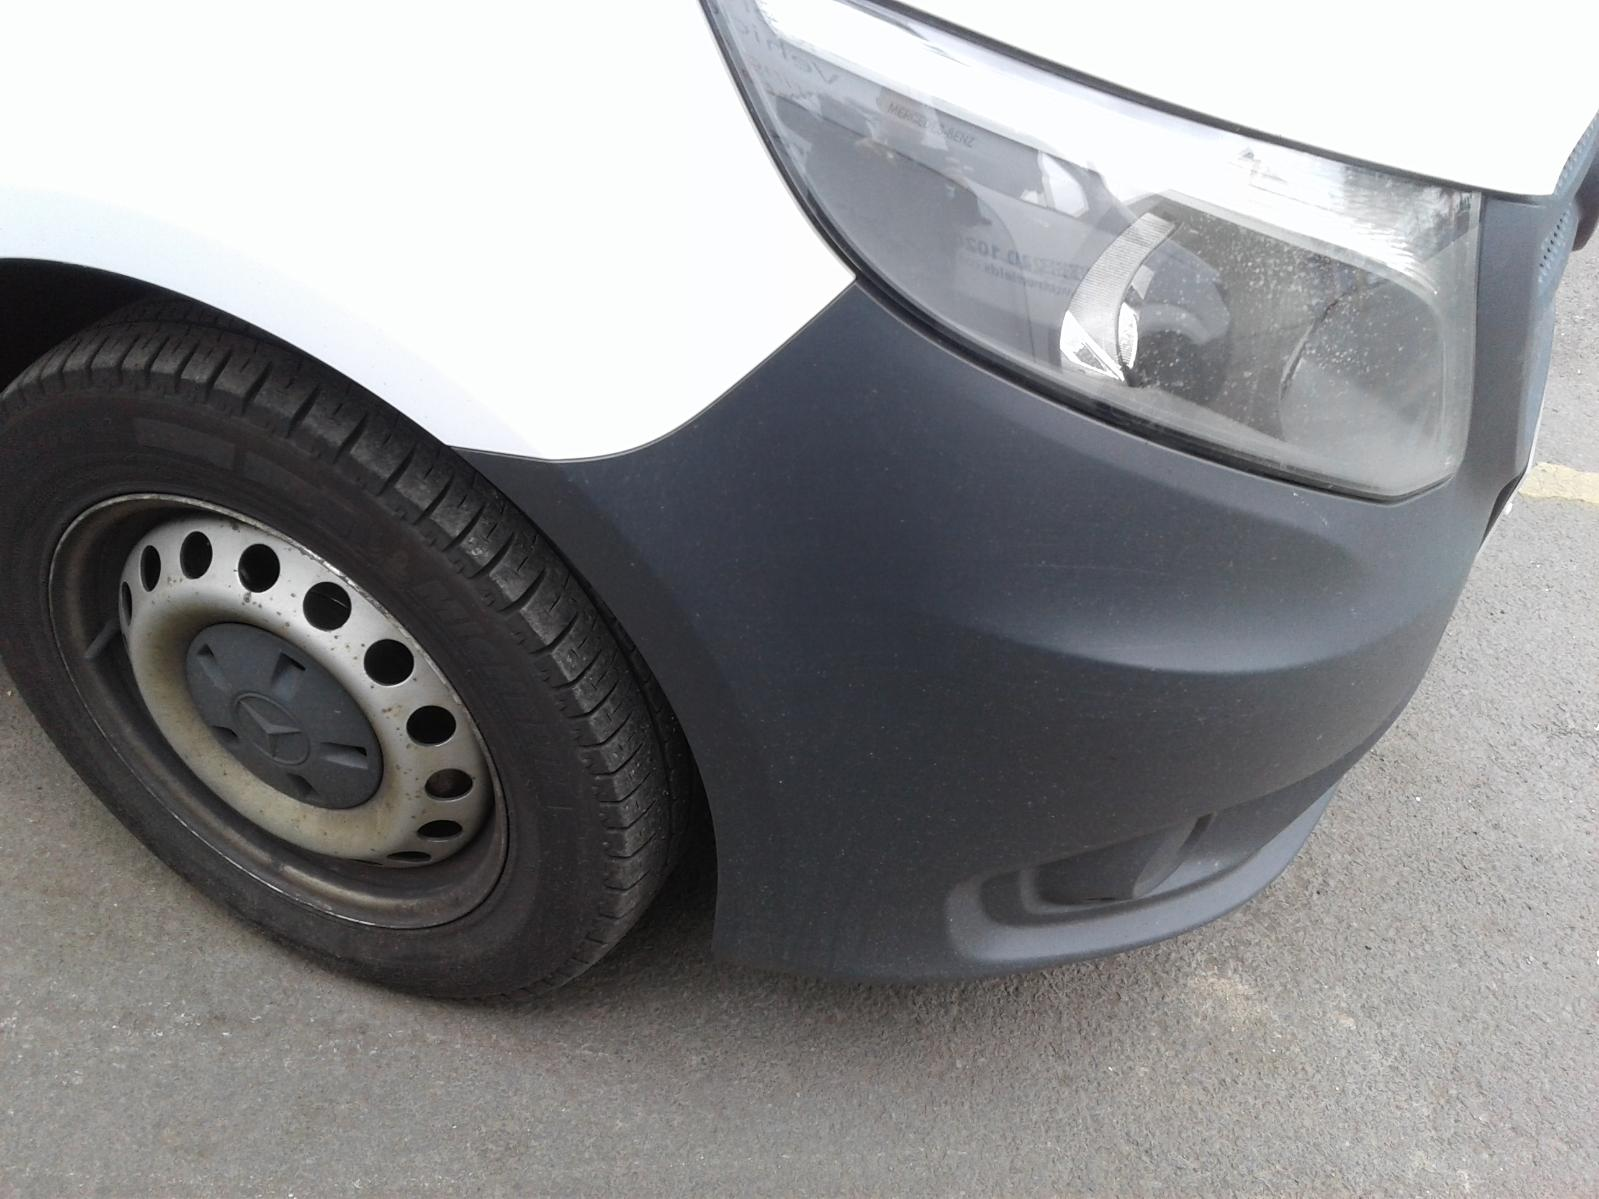 View Auto part LF Strut Mercedes Vito 2015